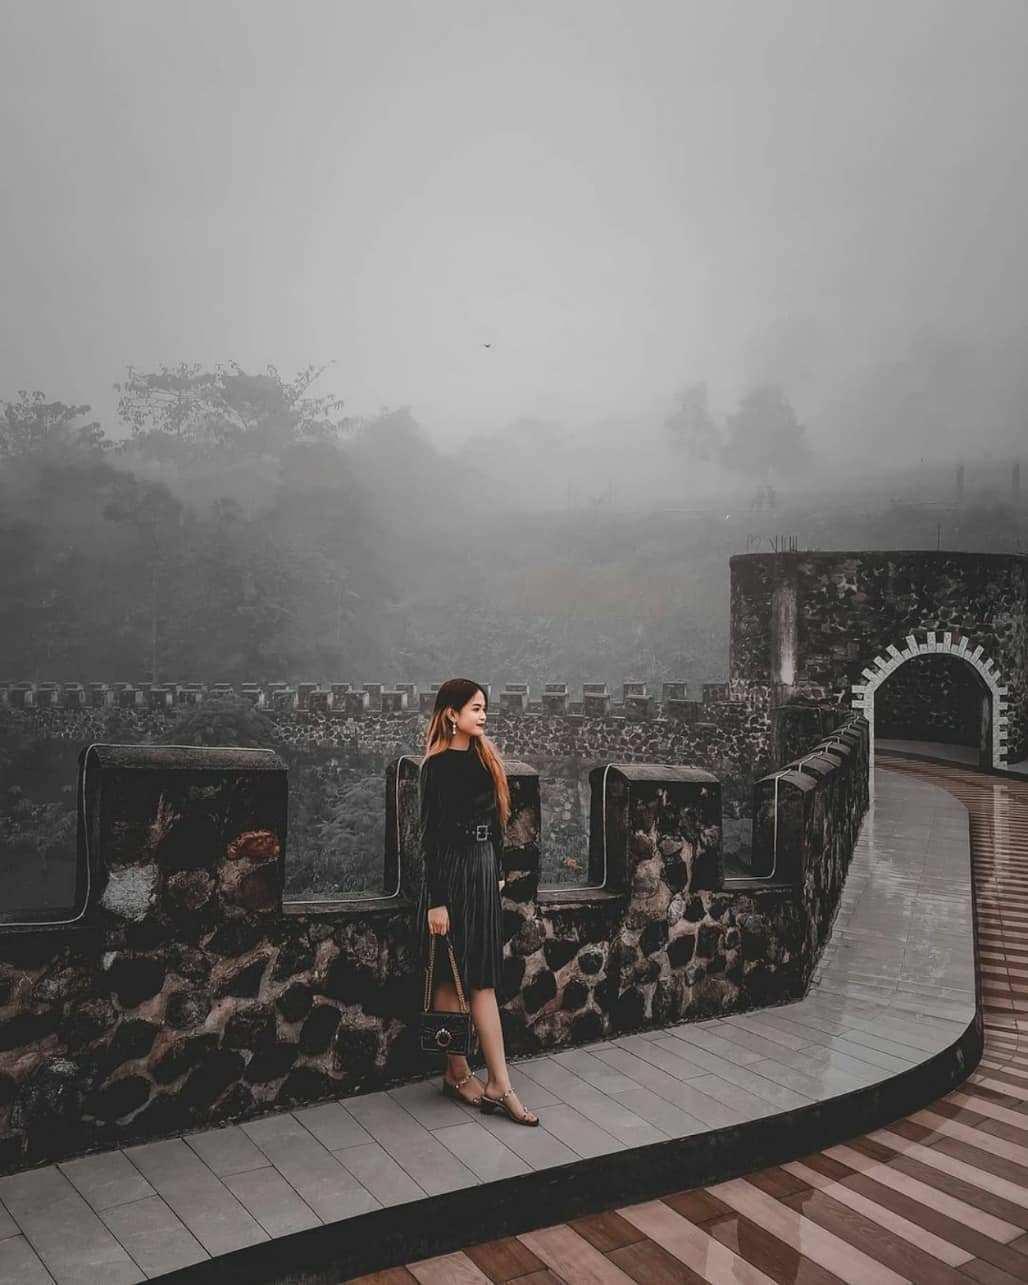 Tembok Castle di The Lost World Castle Image From @spotjogja